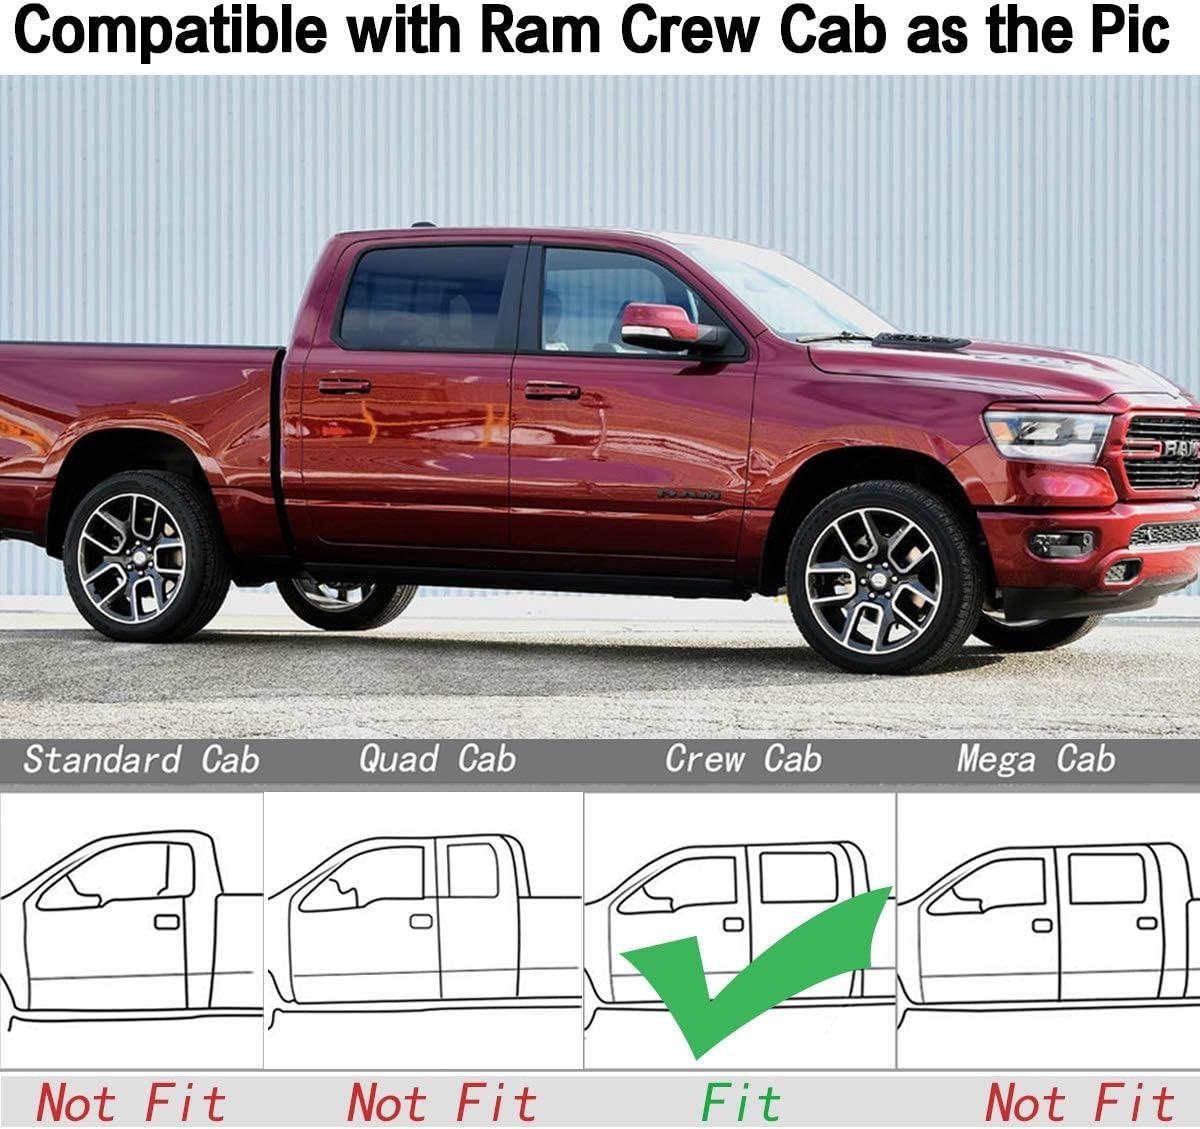 Megiteller Car Floor Mats Custom Fit for 2019 Ram 1500 Classic Crew Cab,2013 2014 2015 2016 2017 2018 Dodge Ram 1500//2500//3500 Crew Cab Odorless Rubber All Weather Floor Liners Blue